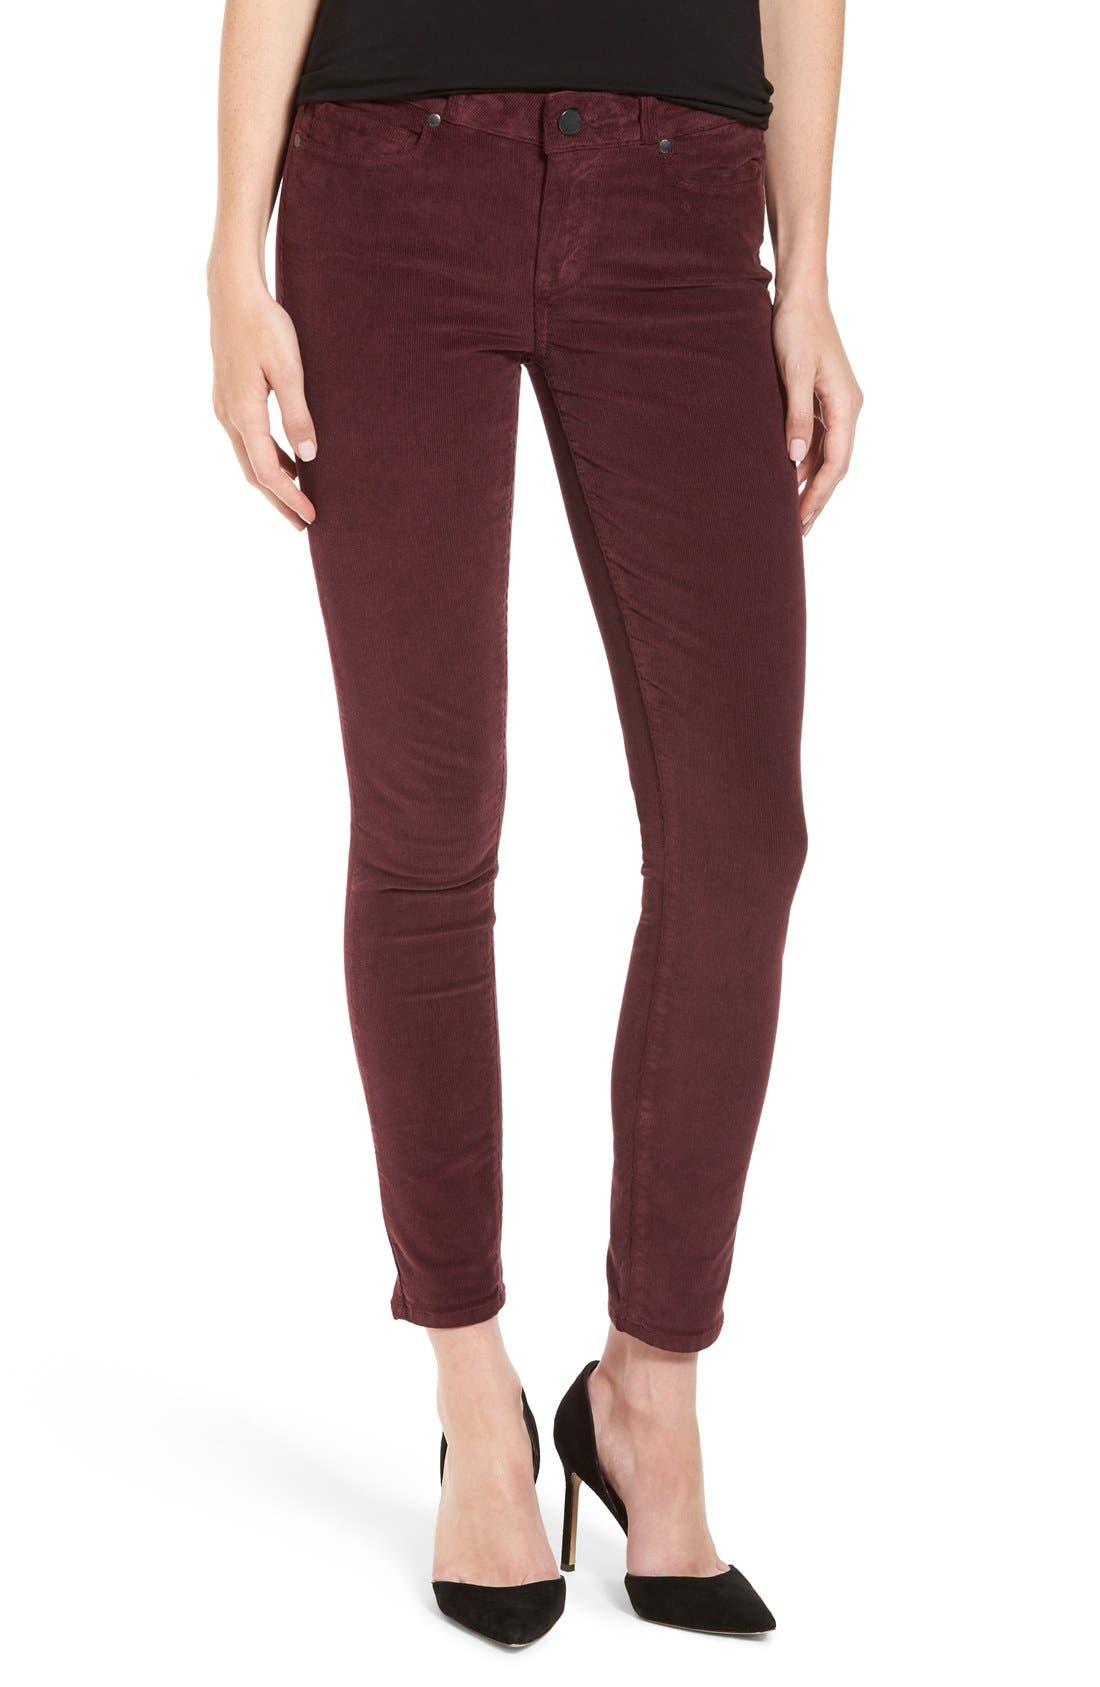 'Verdugo' Ankle Skinny Corduroy Pants, Main, color, 500